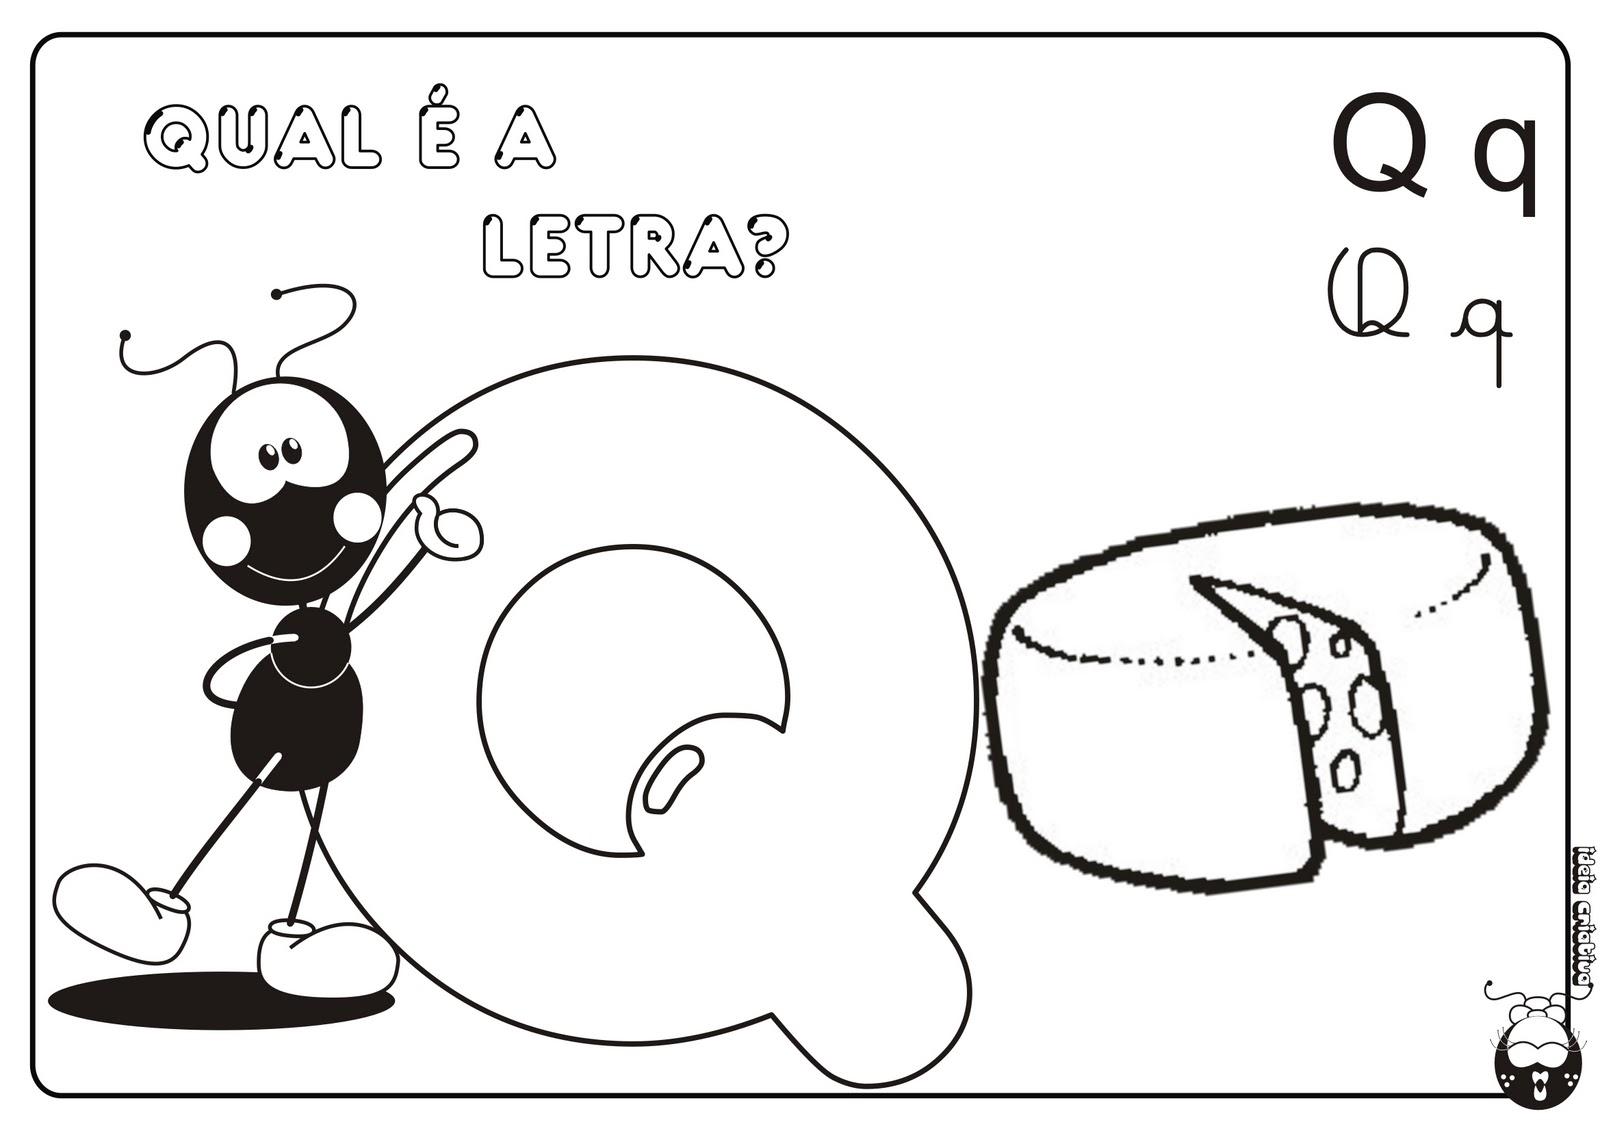 Alfabeto Smilinguido 4 tipos de letra para Baixar Grátis Letra q